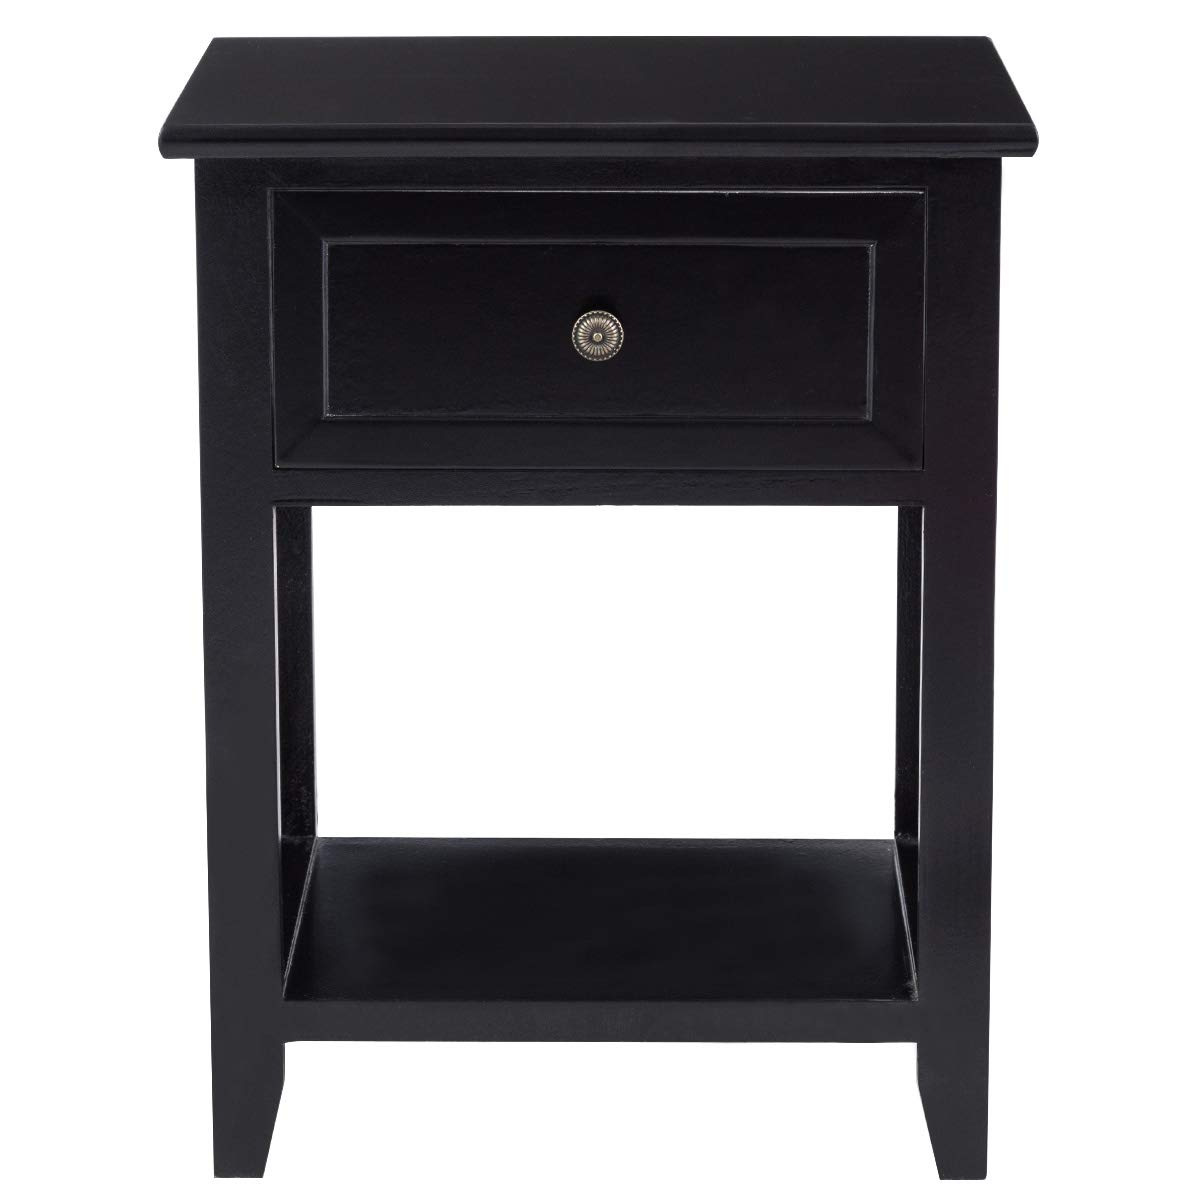 Giantex 2 Pcs Nightstand End Bedside Table Home Bedroom Furniture X-Shape W/Bottom Open Shelf Drawer, Black by Giantex (Image #7)